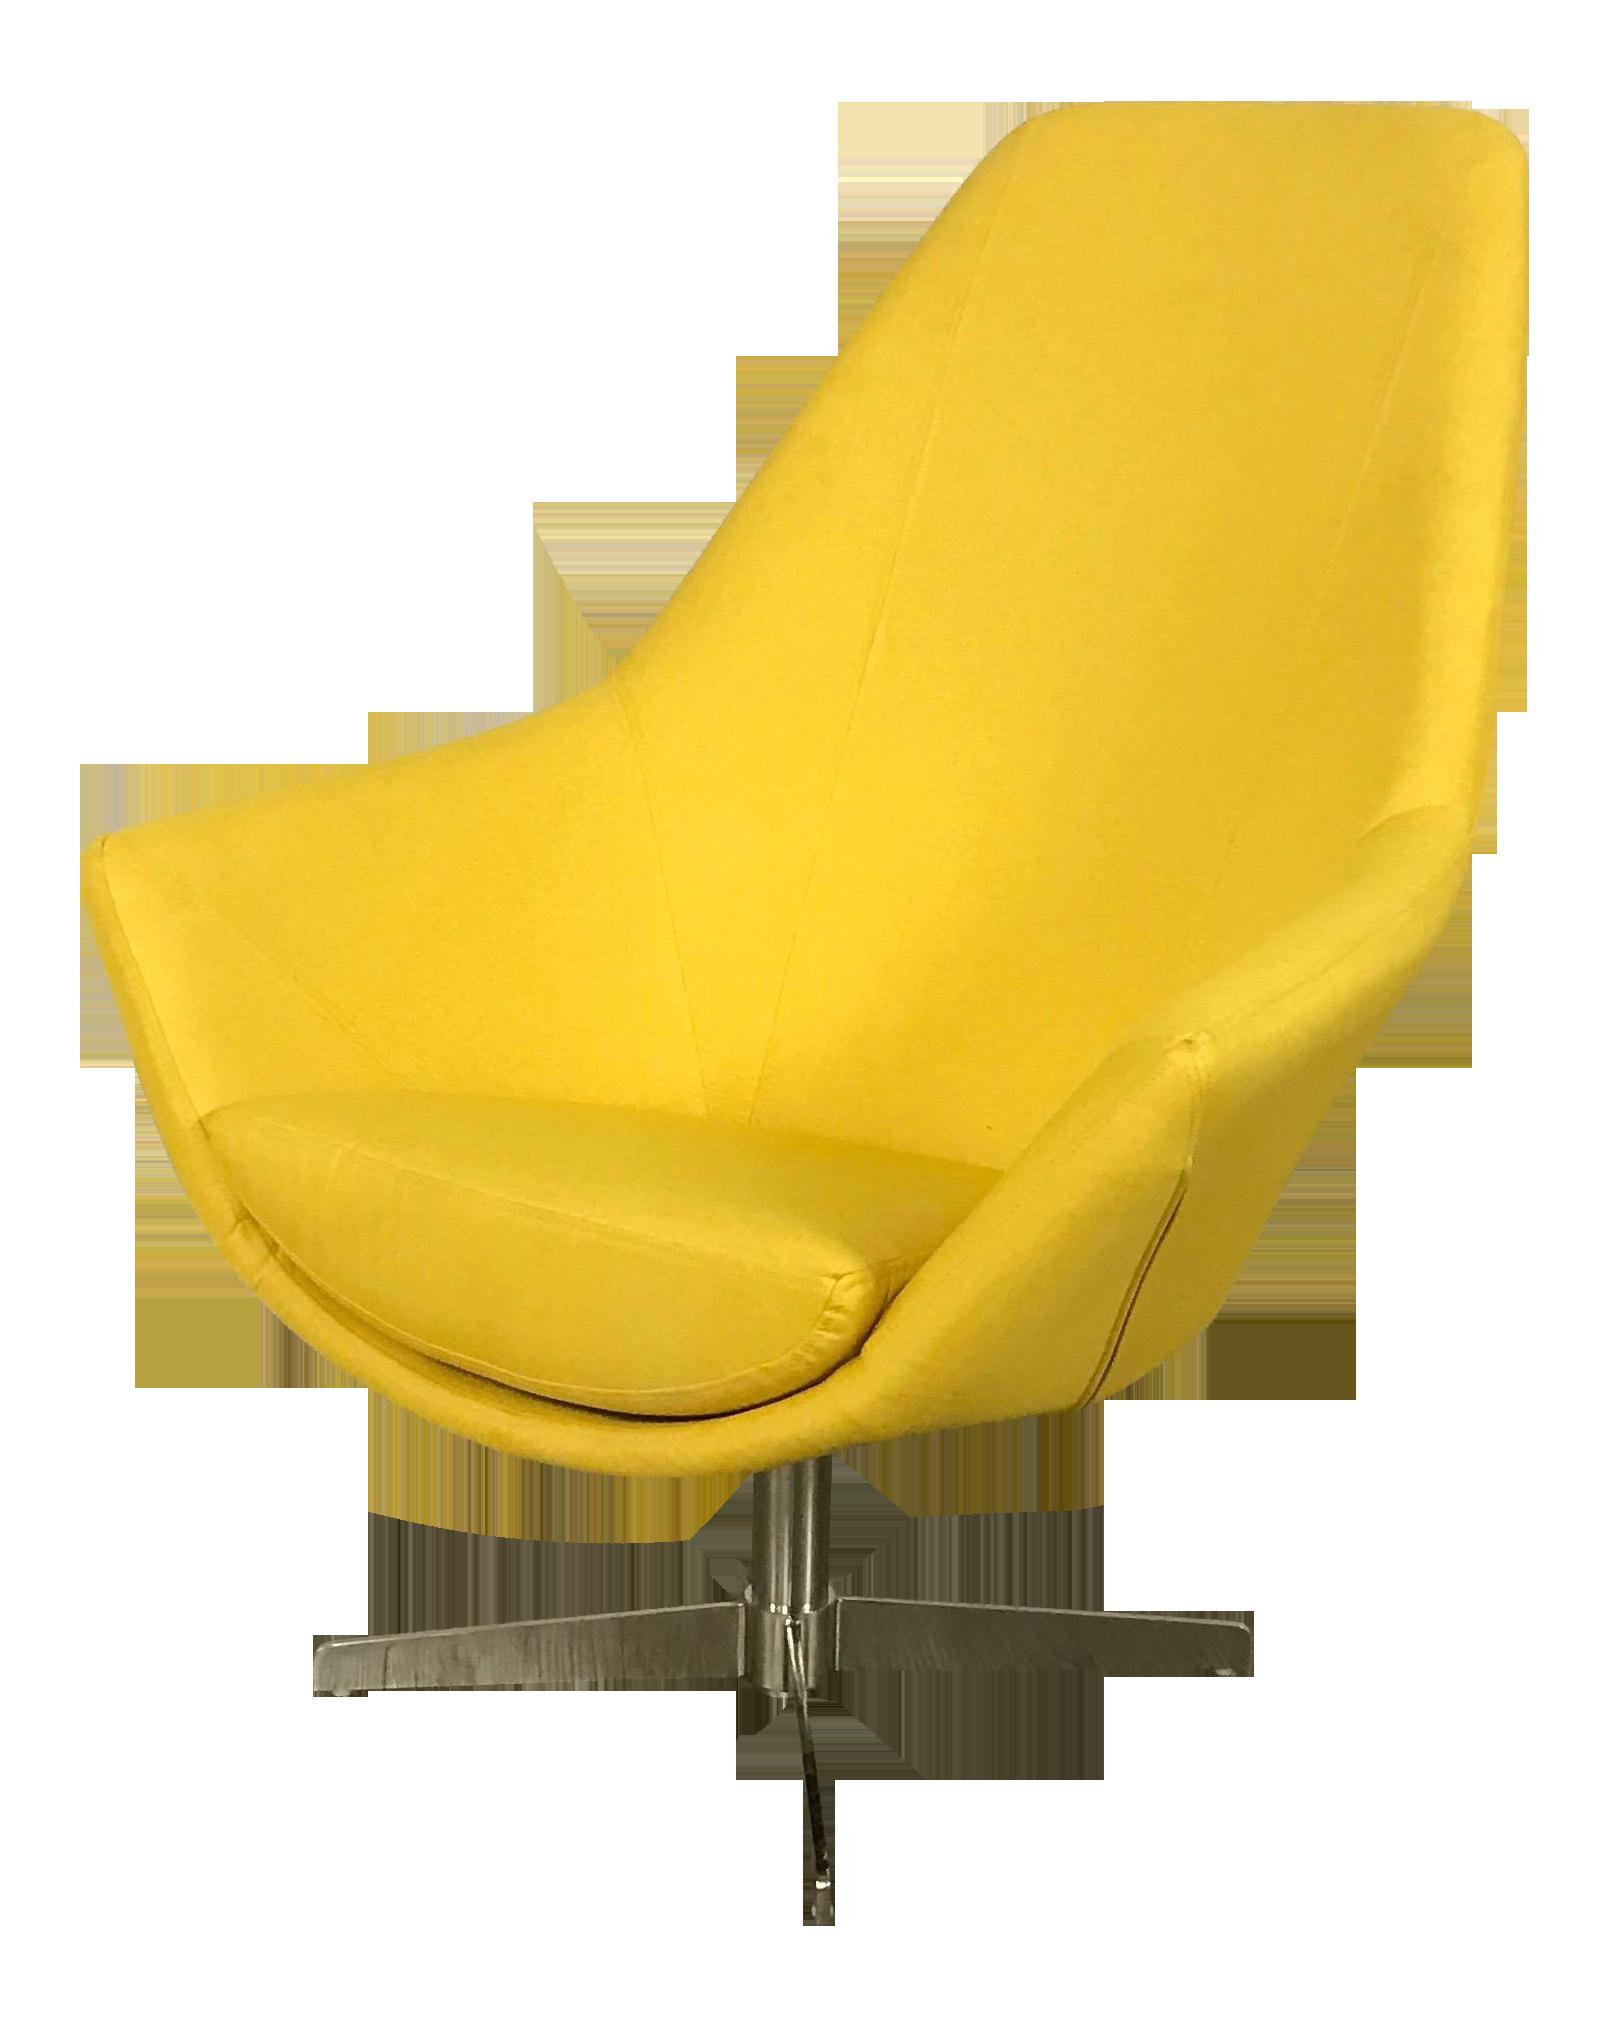 Image of Modani Modern Yellow Lounge ChairModani Modern Yellow Lounge Chair   Chairish. Modern Yellow Lounge Chair. Home Design Ideas